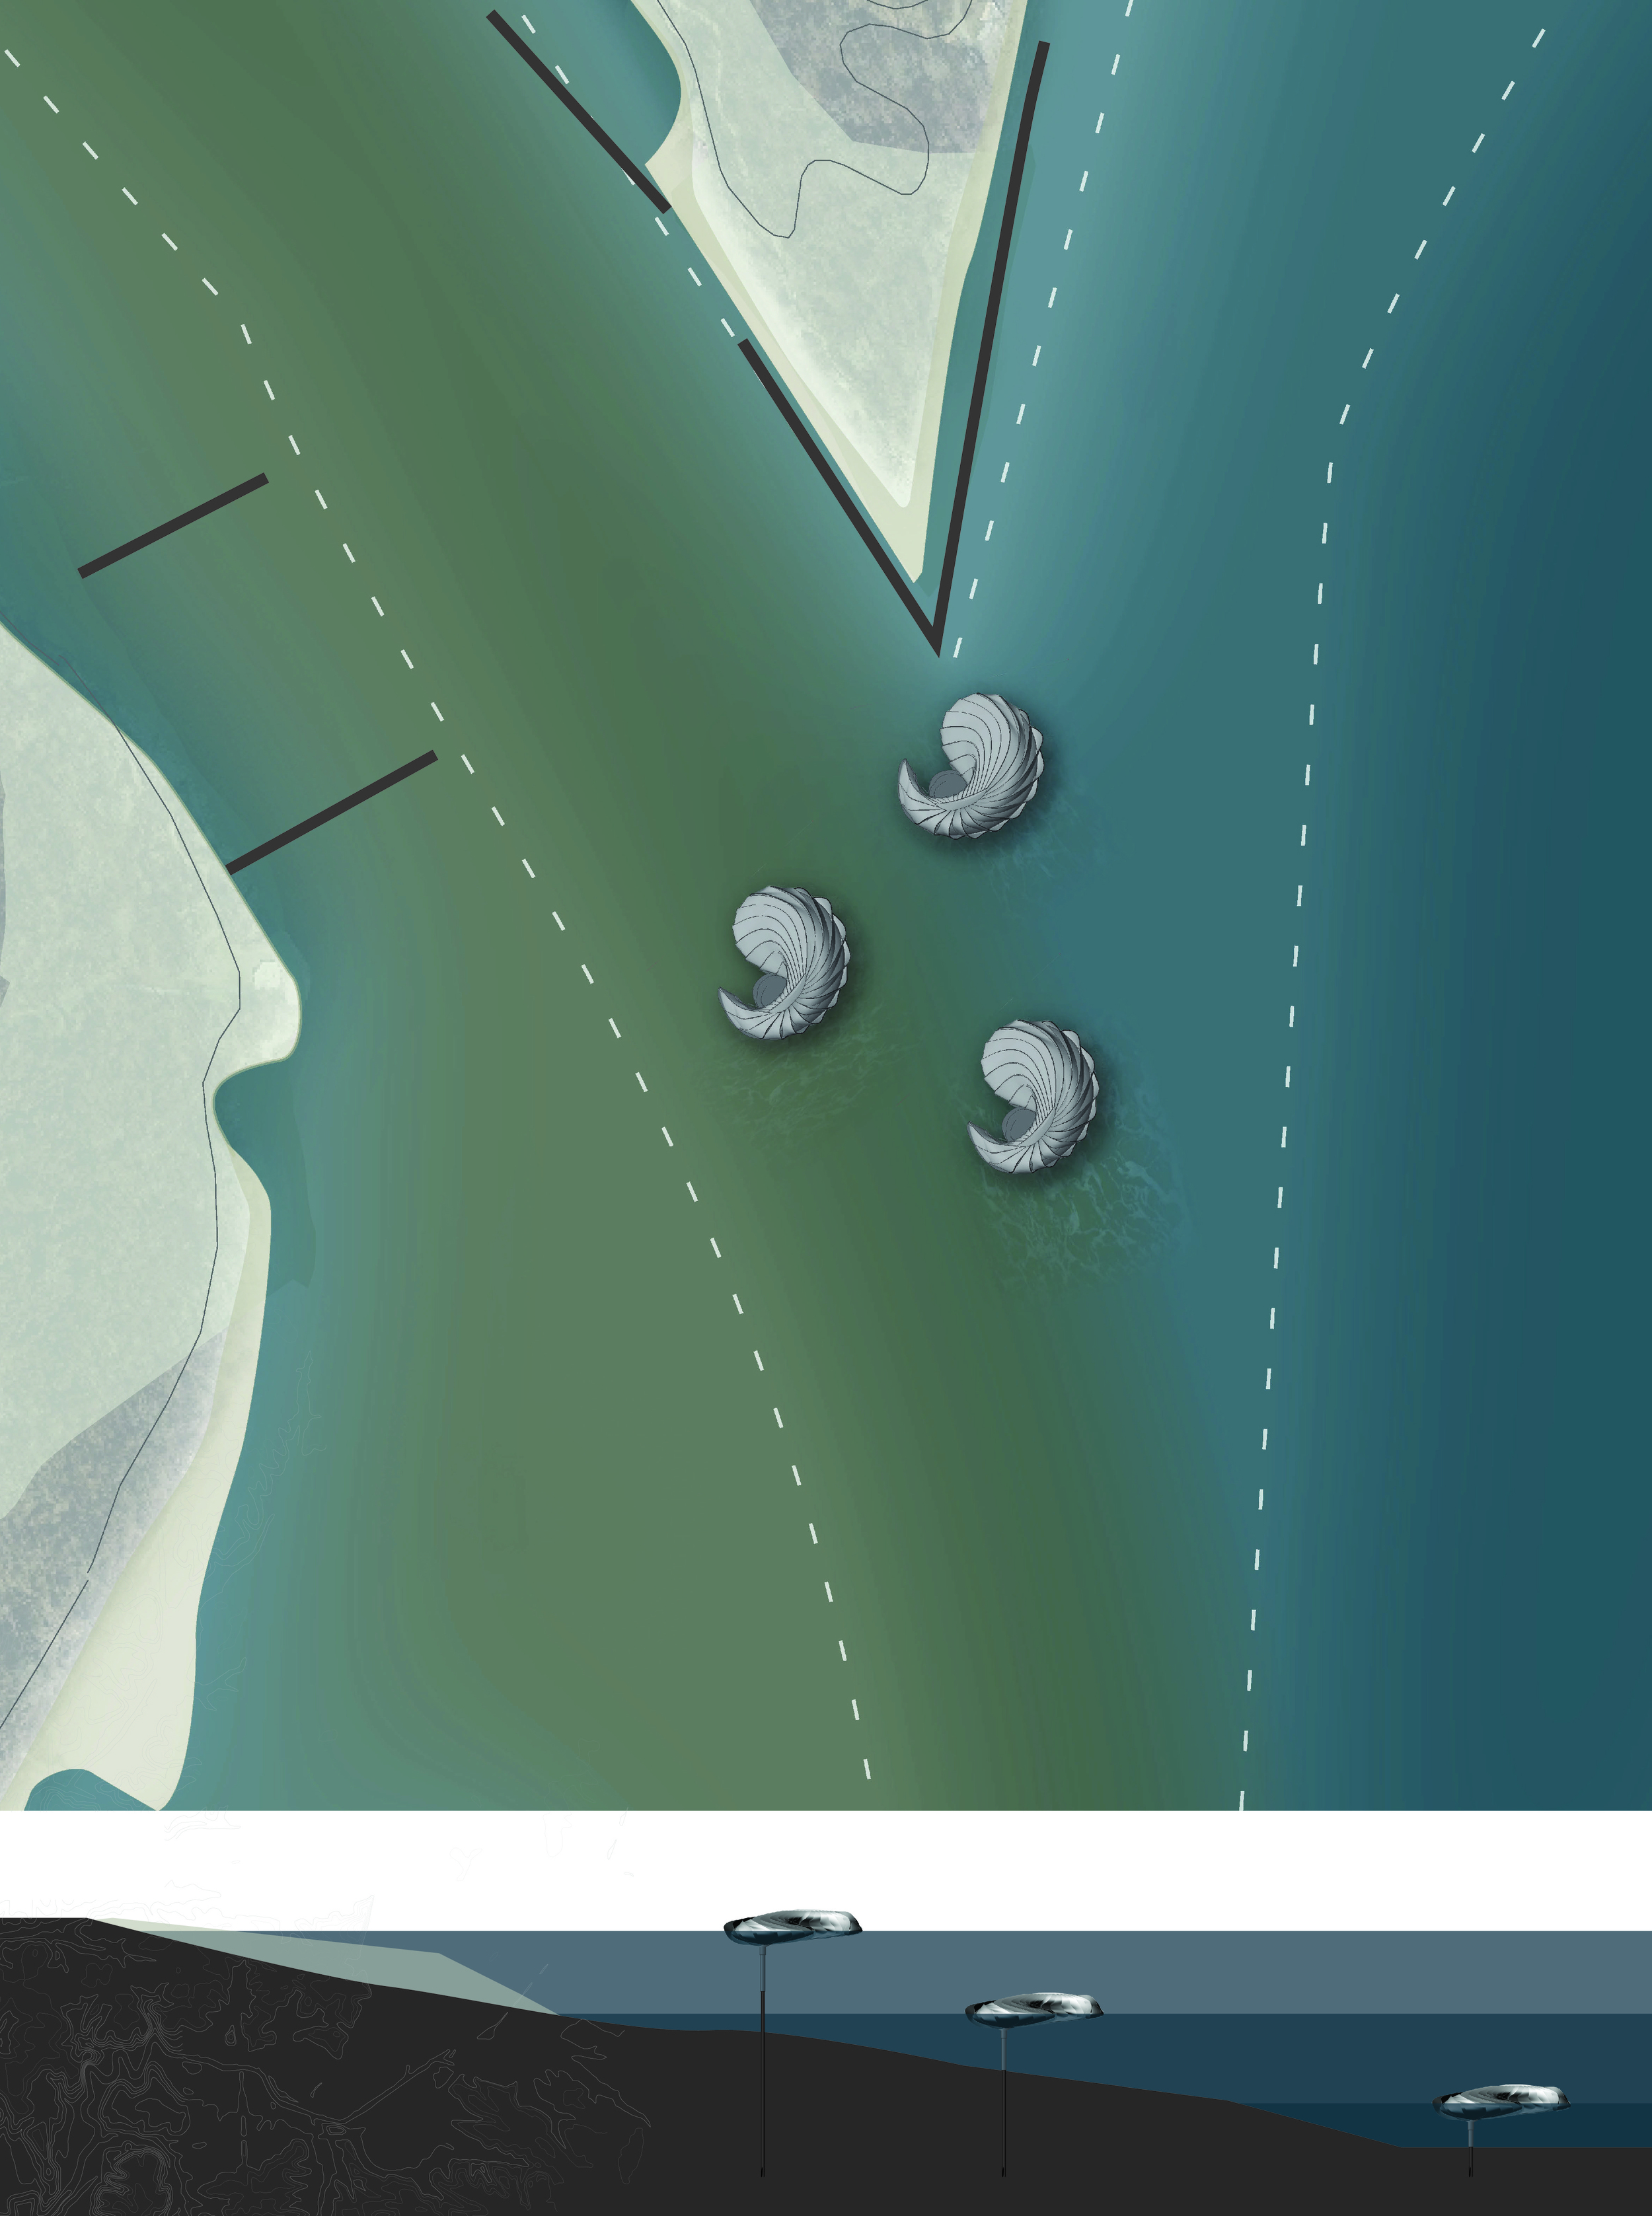 10_Sediment_Pucks_Tiffin_Thompson_Site_Plan_and_Section.jpg